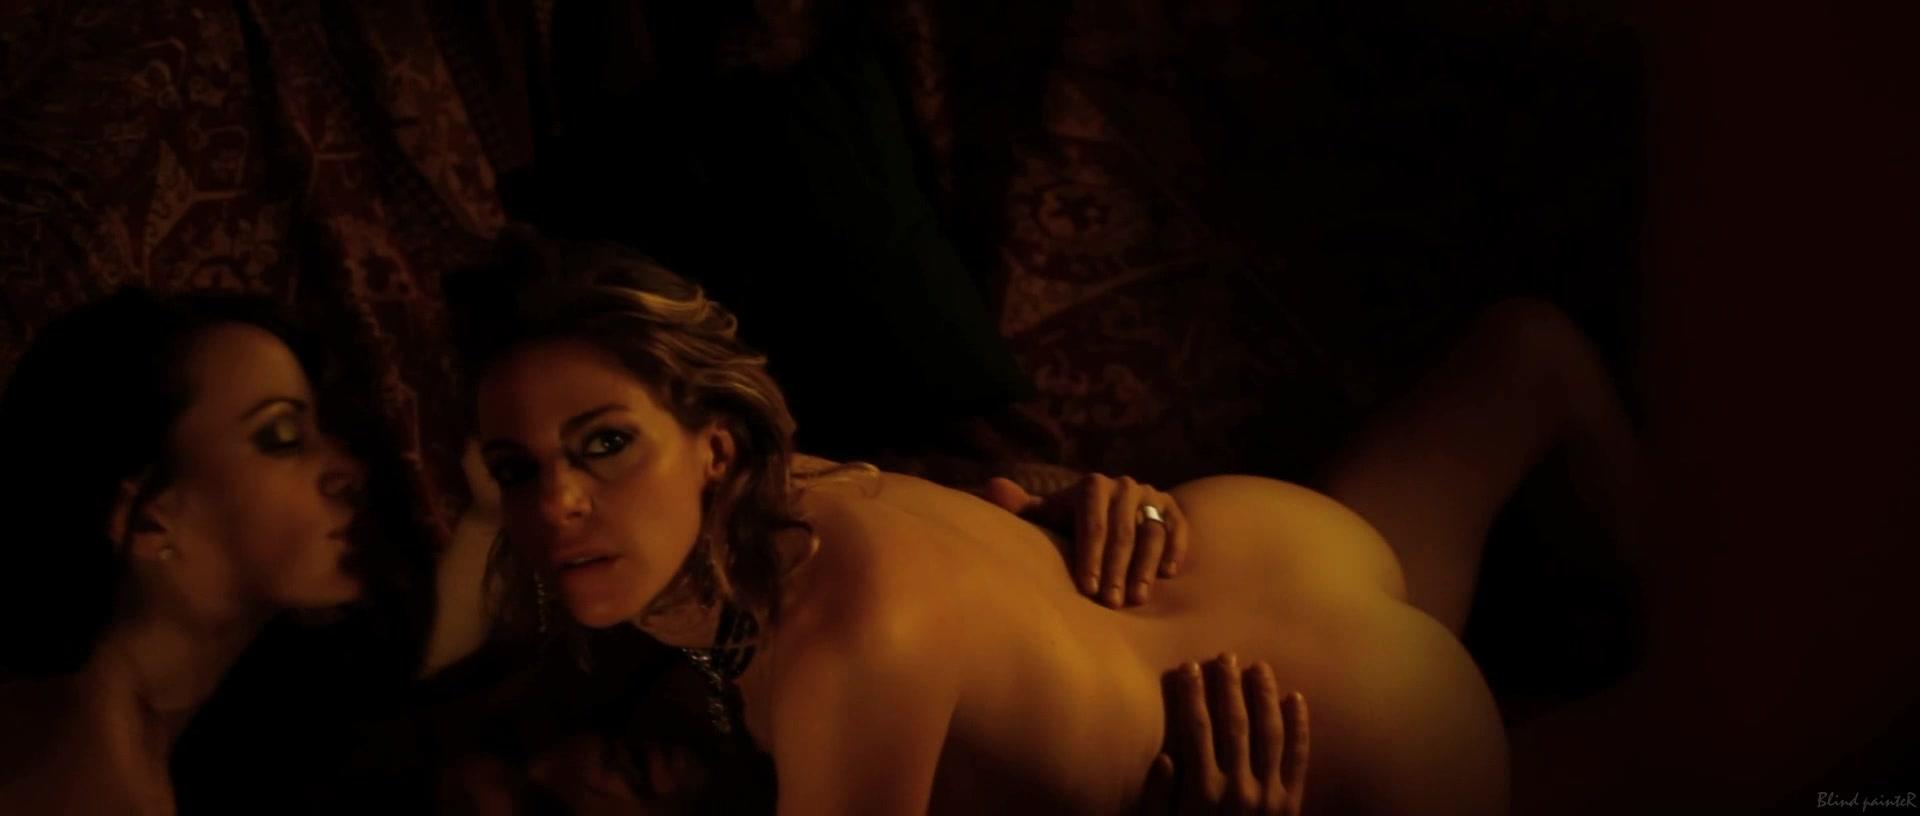 Porno Claudia Gerini nude photos 2019